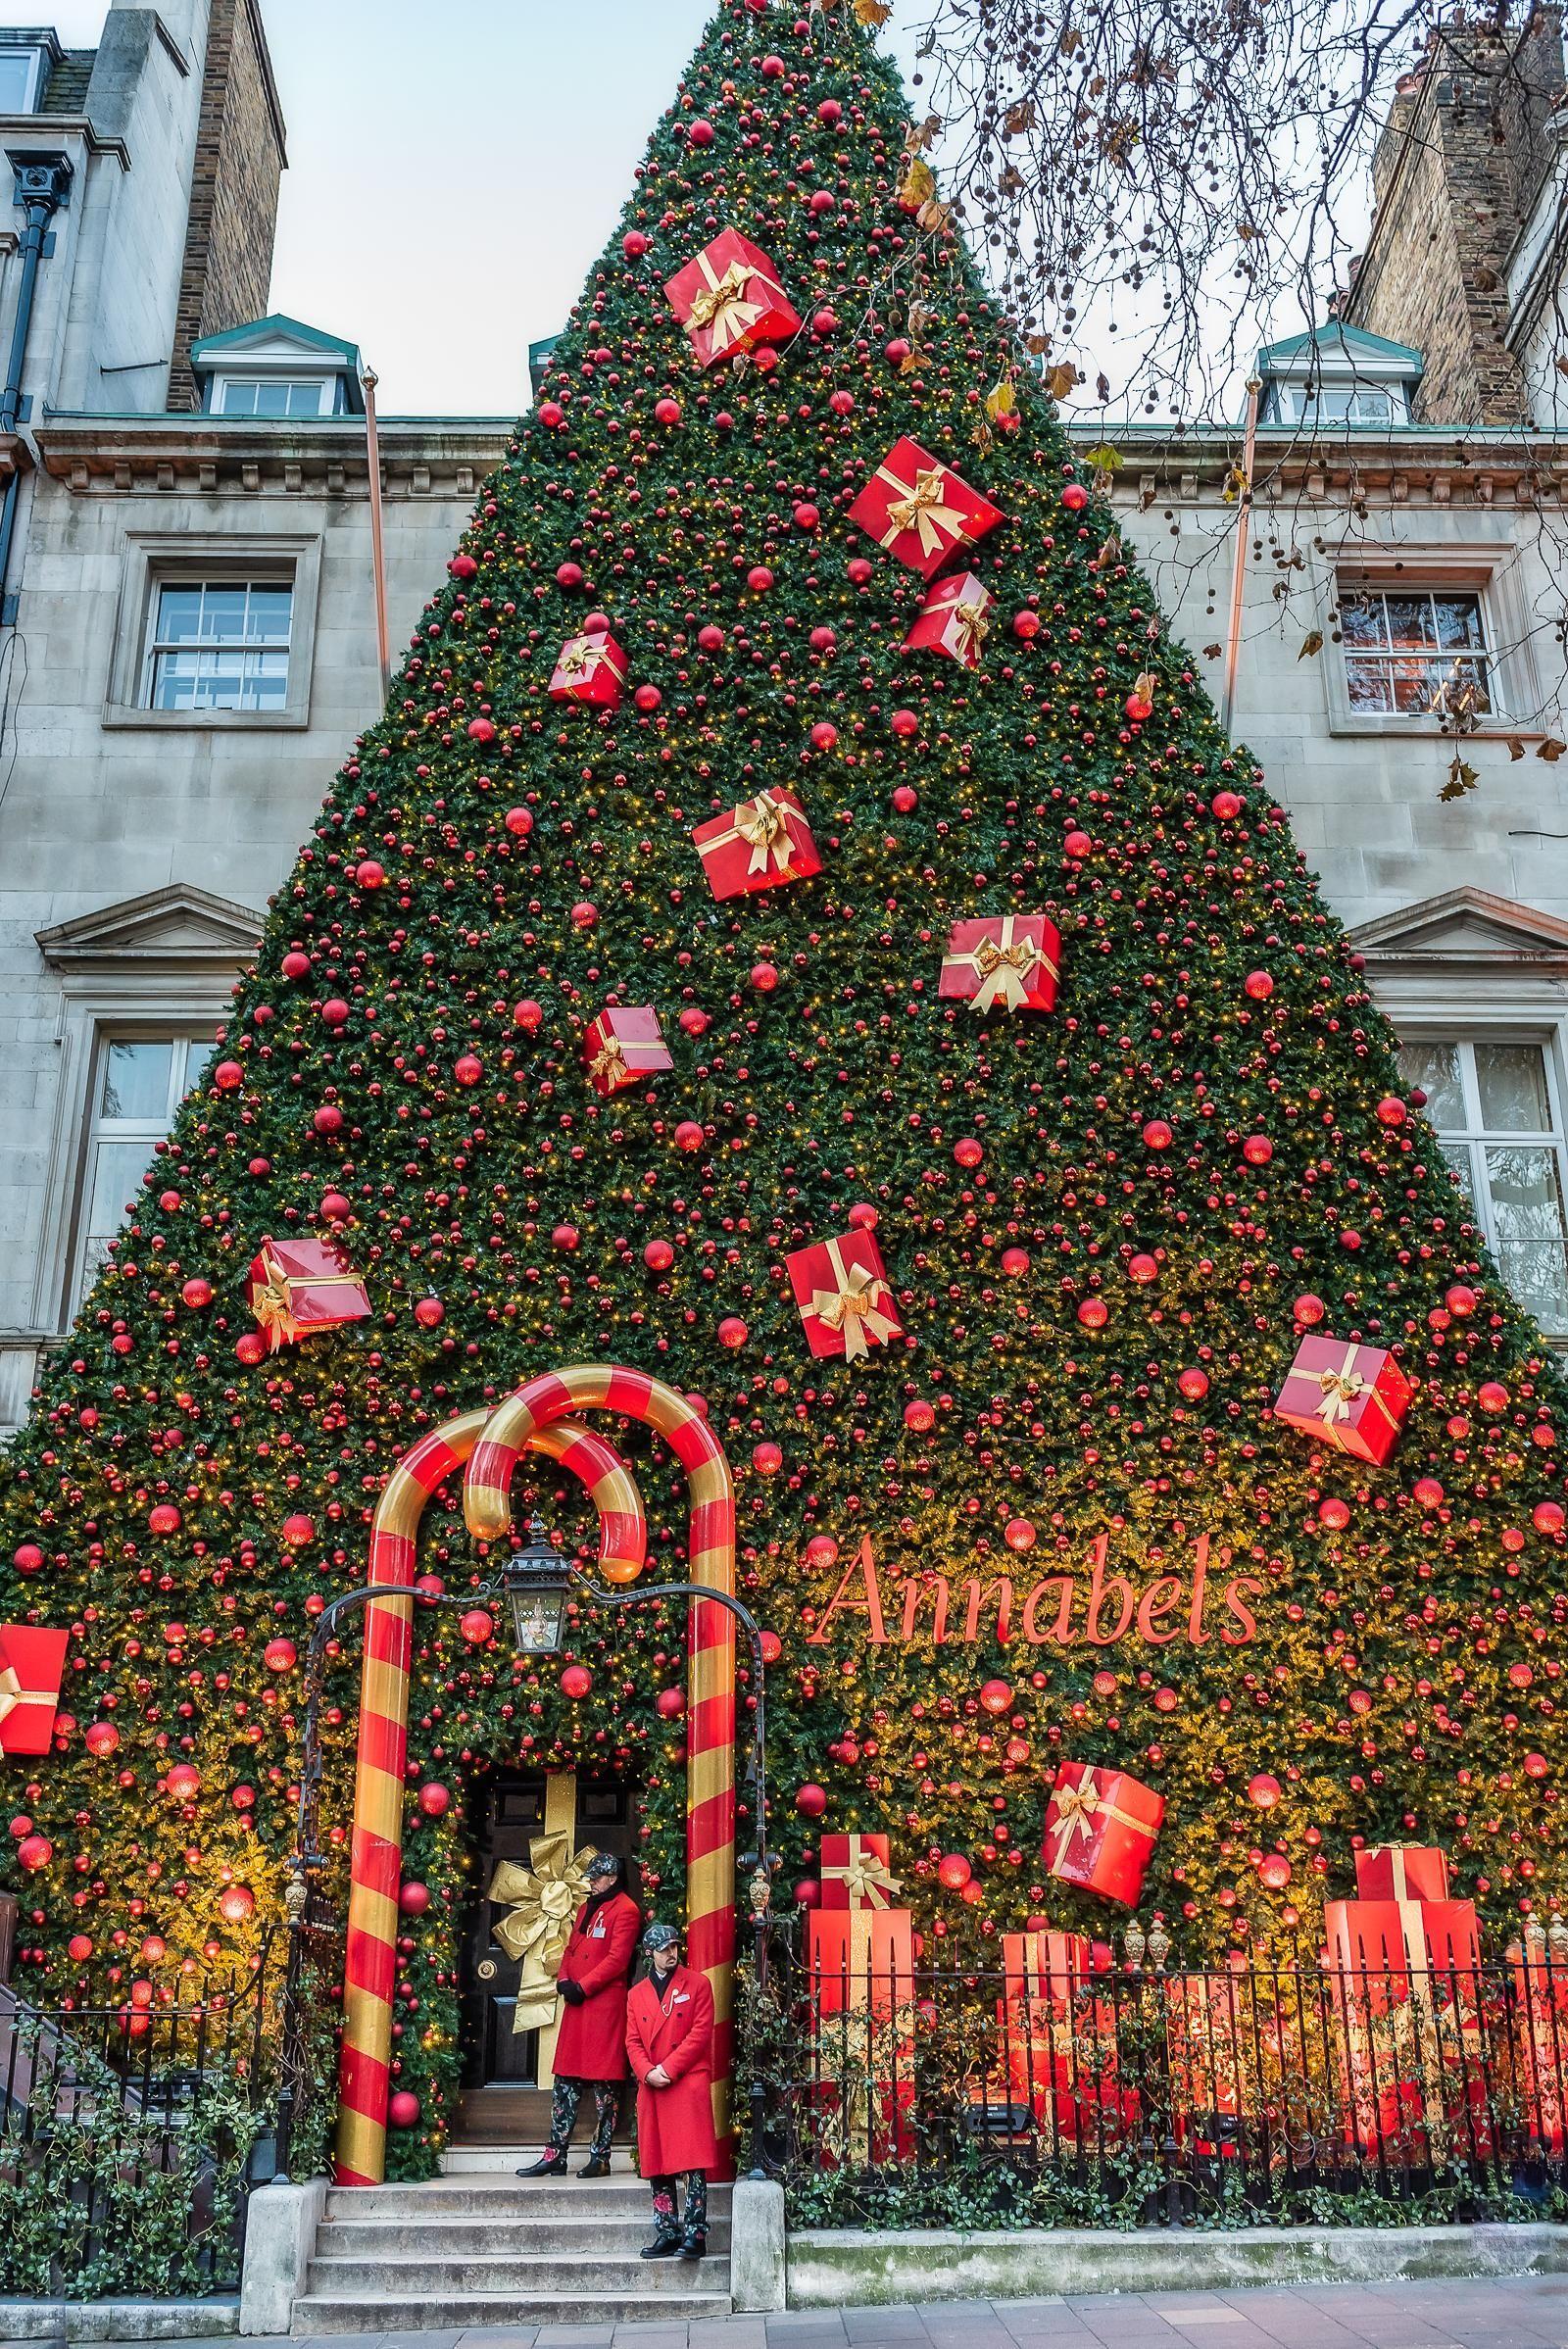 Christmastime In London Sed Bona In 2020 London Christmas London In December London